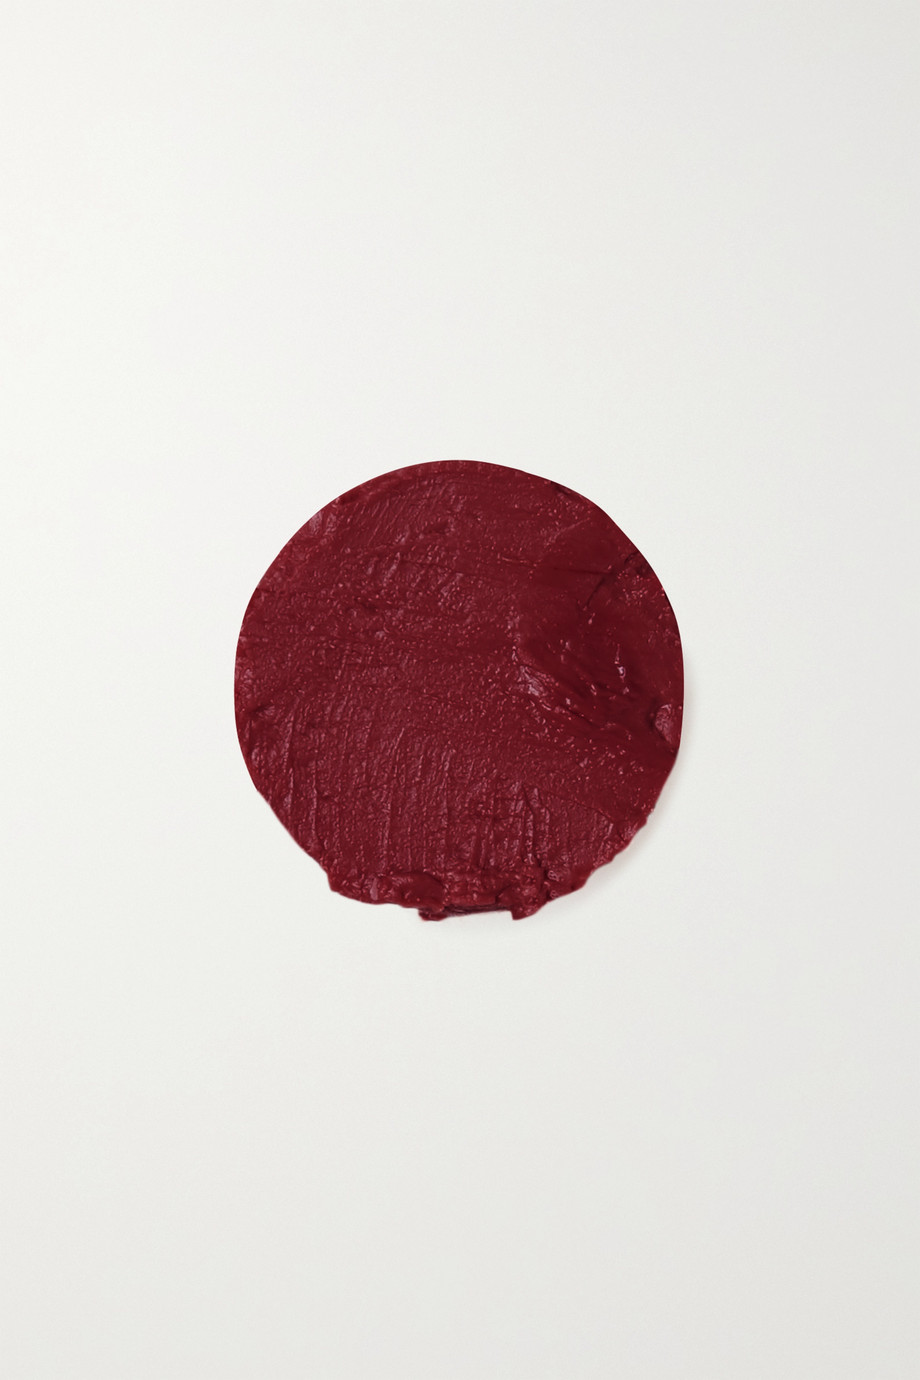 Kevyn Aucoin Unforgettable Lipstick - Bloodroses